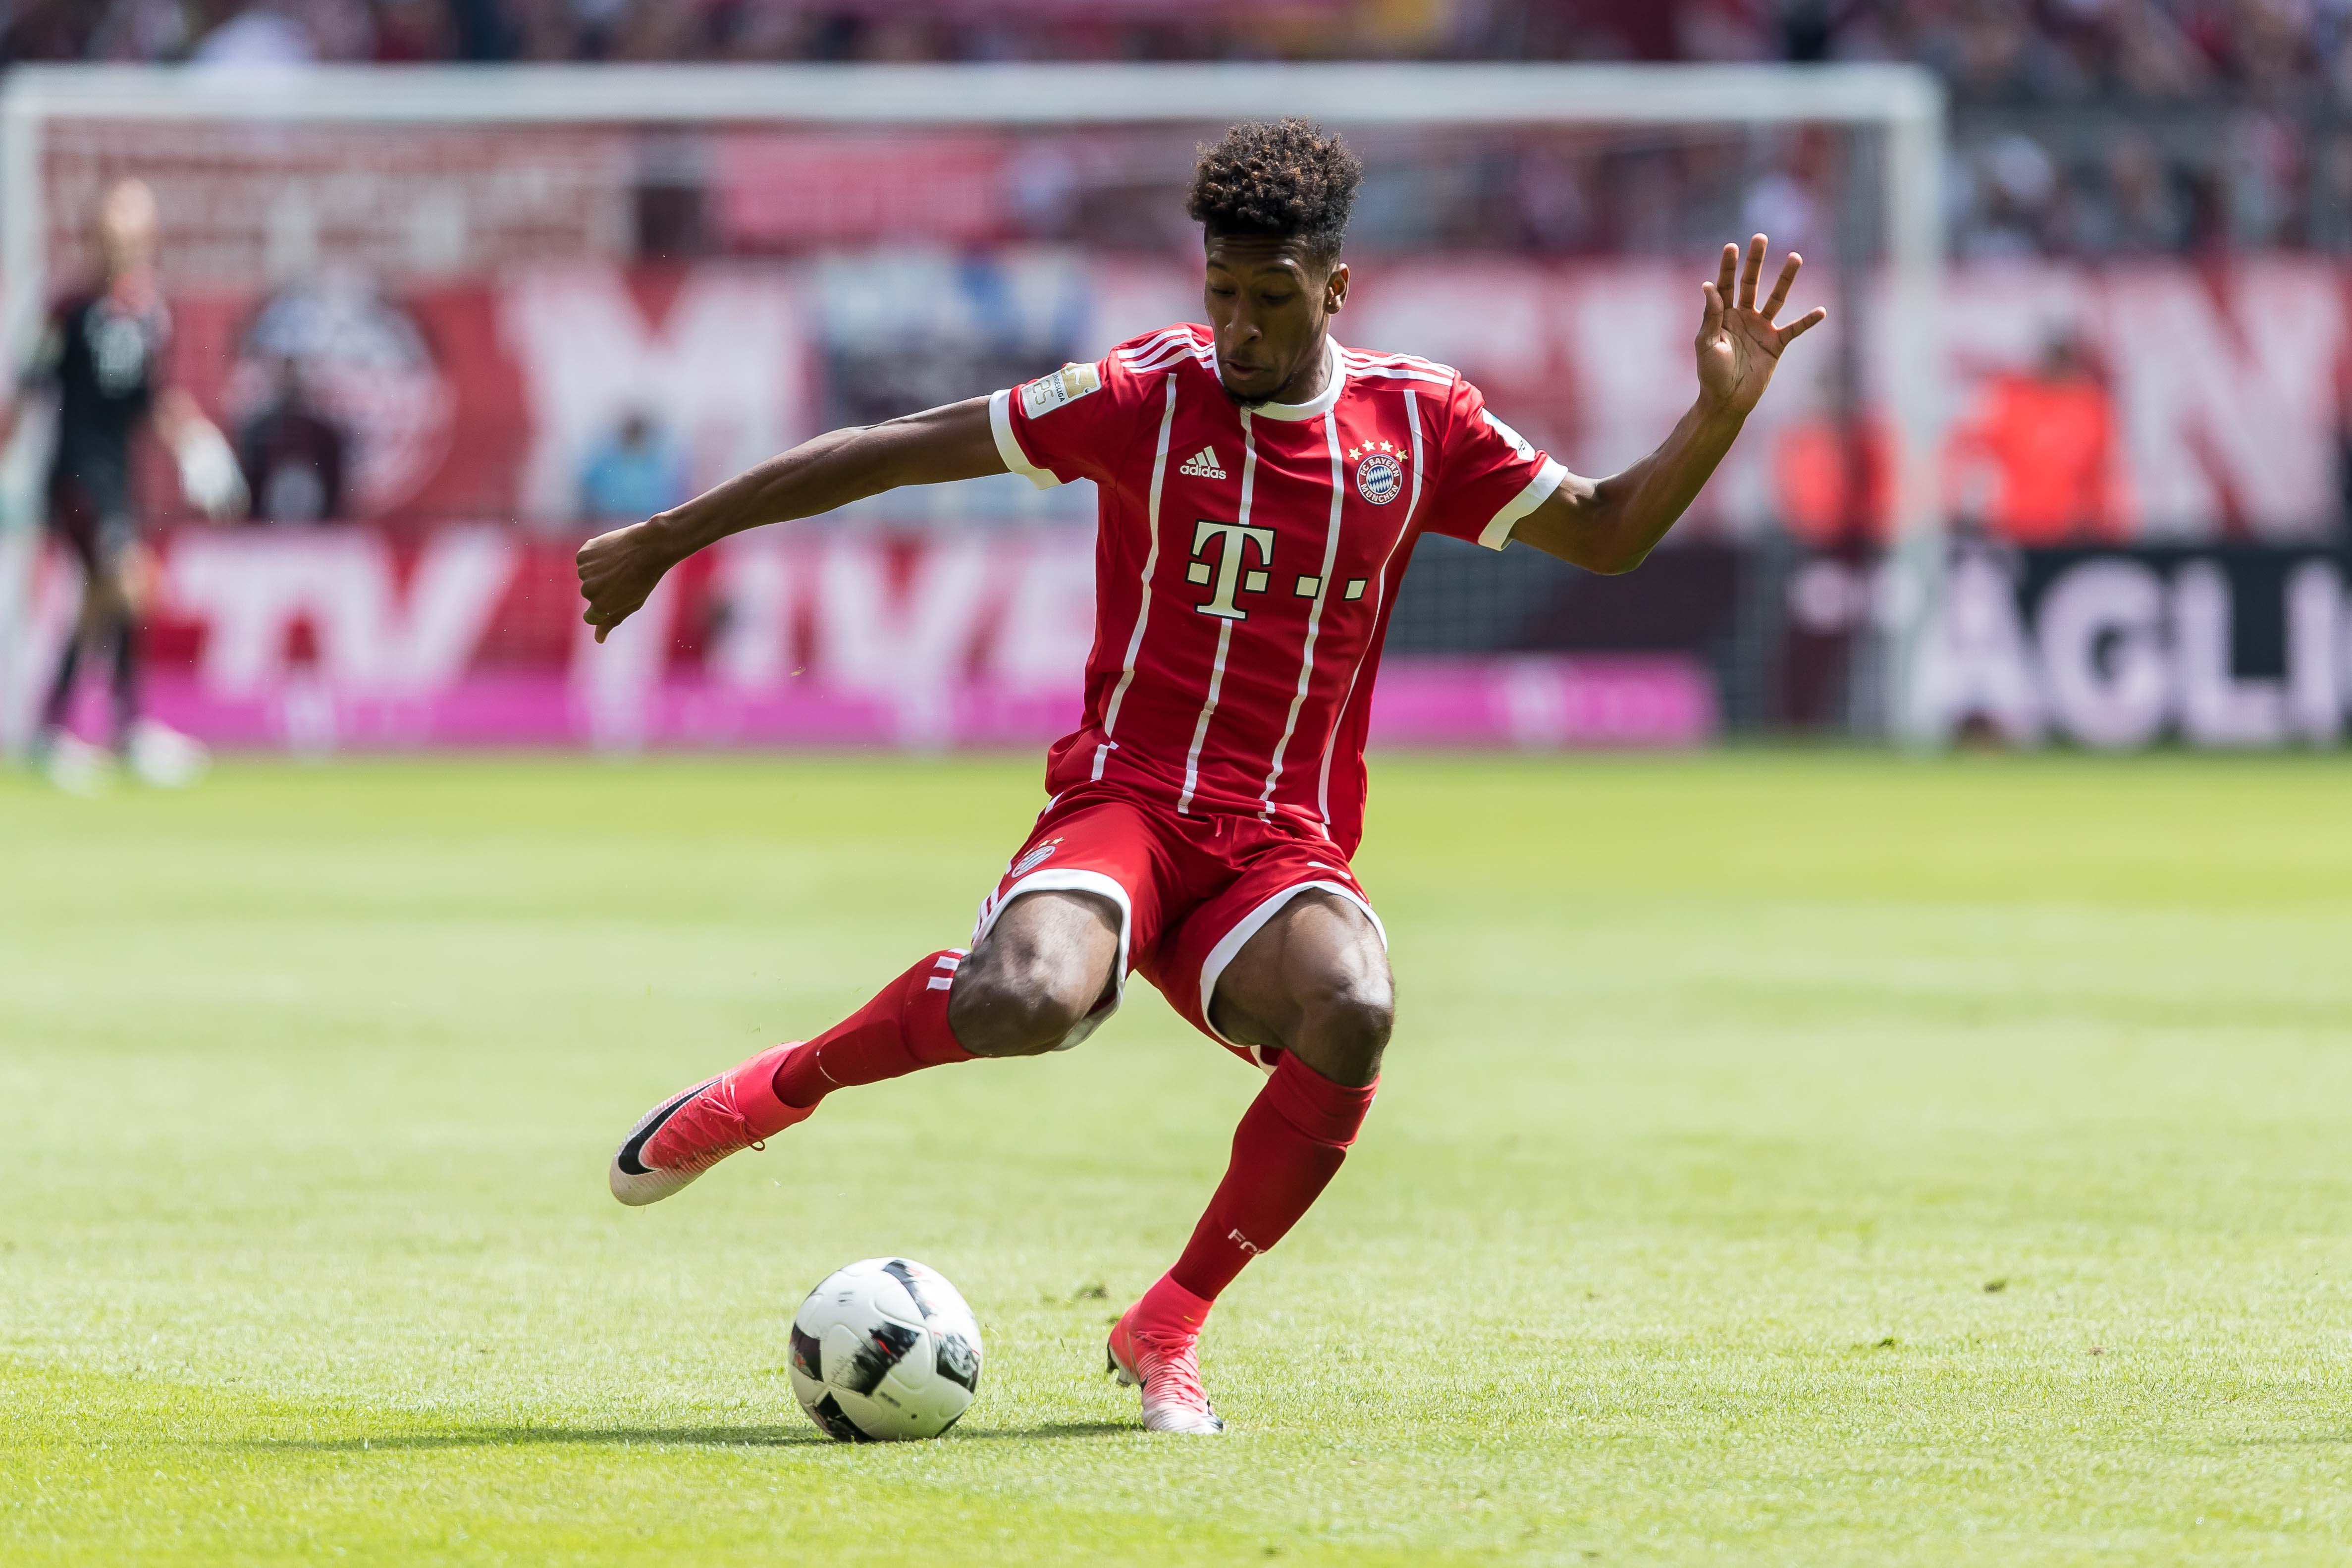 Usas scoreless draw vs serbia offers glimpse into arenas preferences foxsports com - Reports Bayern S Kingsley